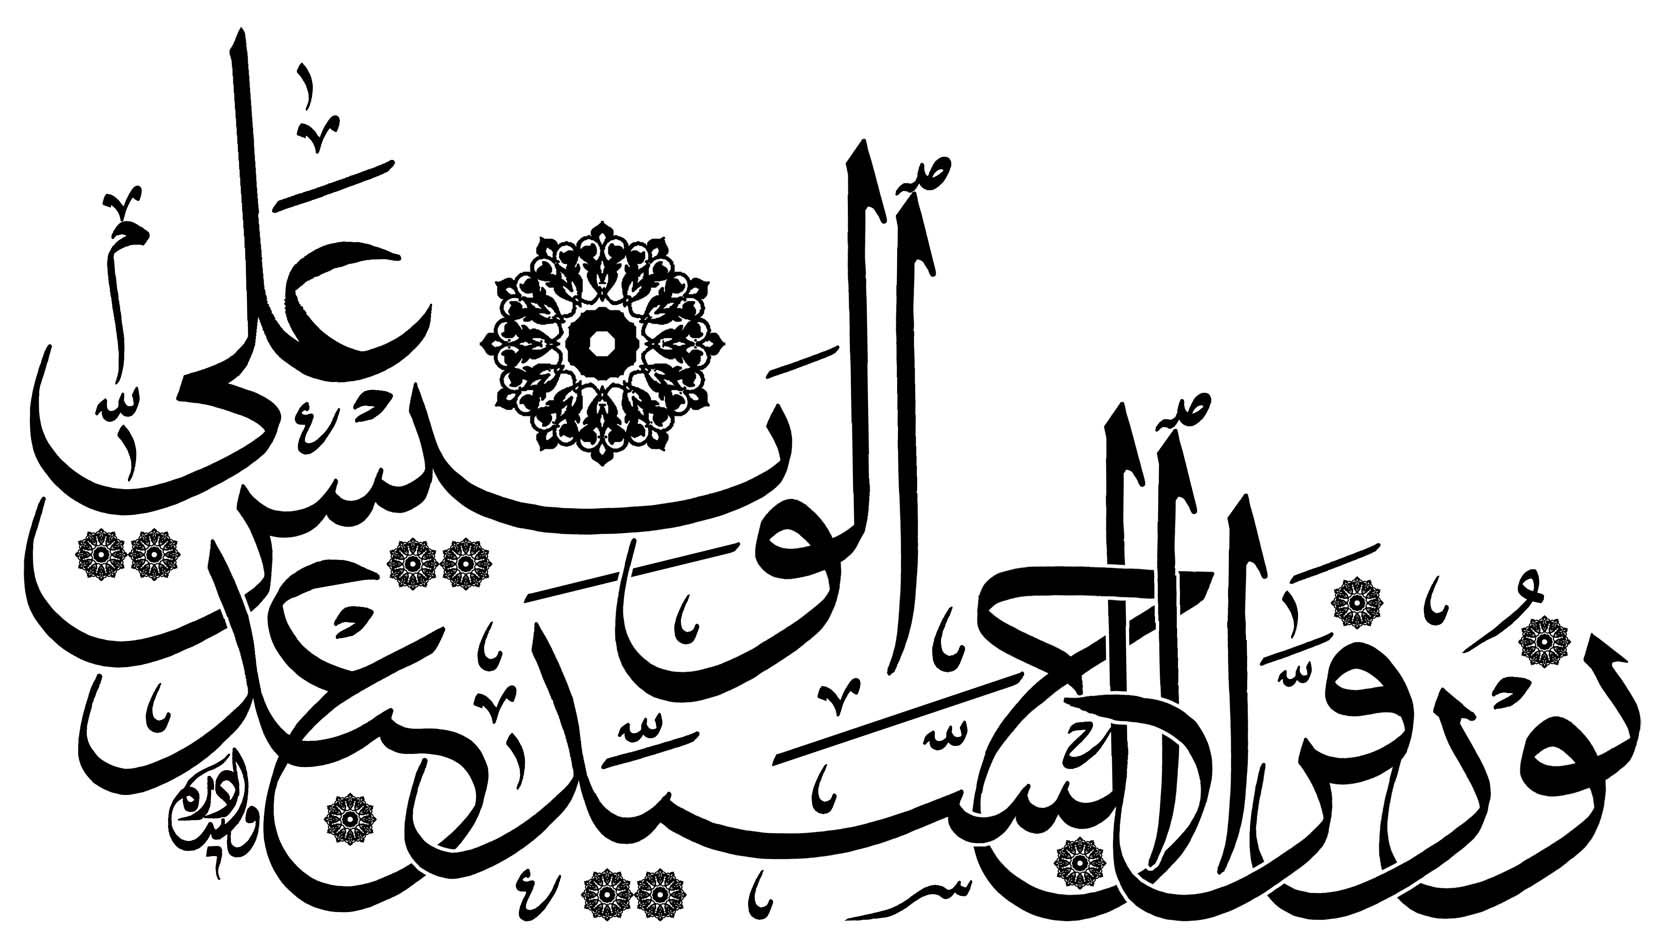 Calligraphy Handwriting نور فراج السيد عبد الونيس علي تركيبة خط الثلث زخرفة للتنقيط Arabic Calligraphy Calligraphy Art